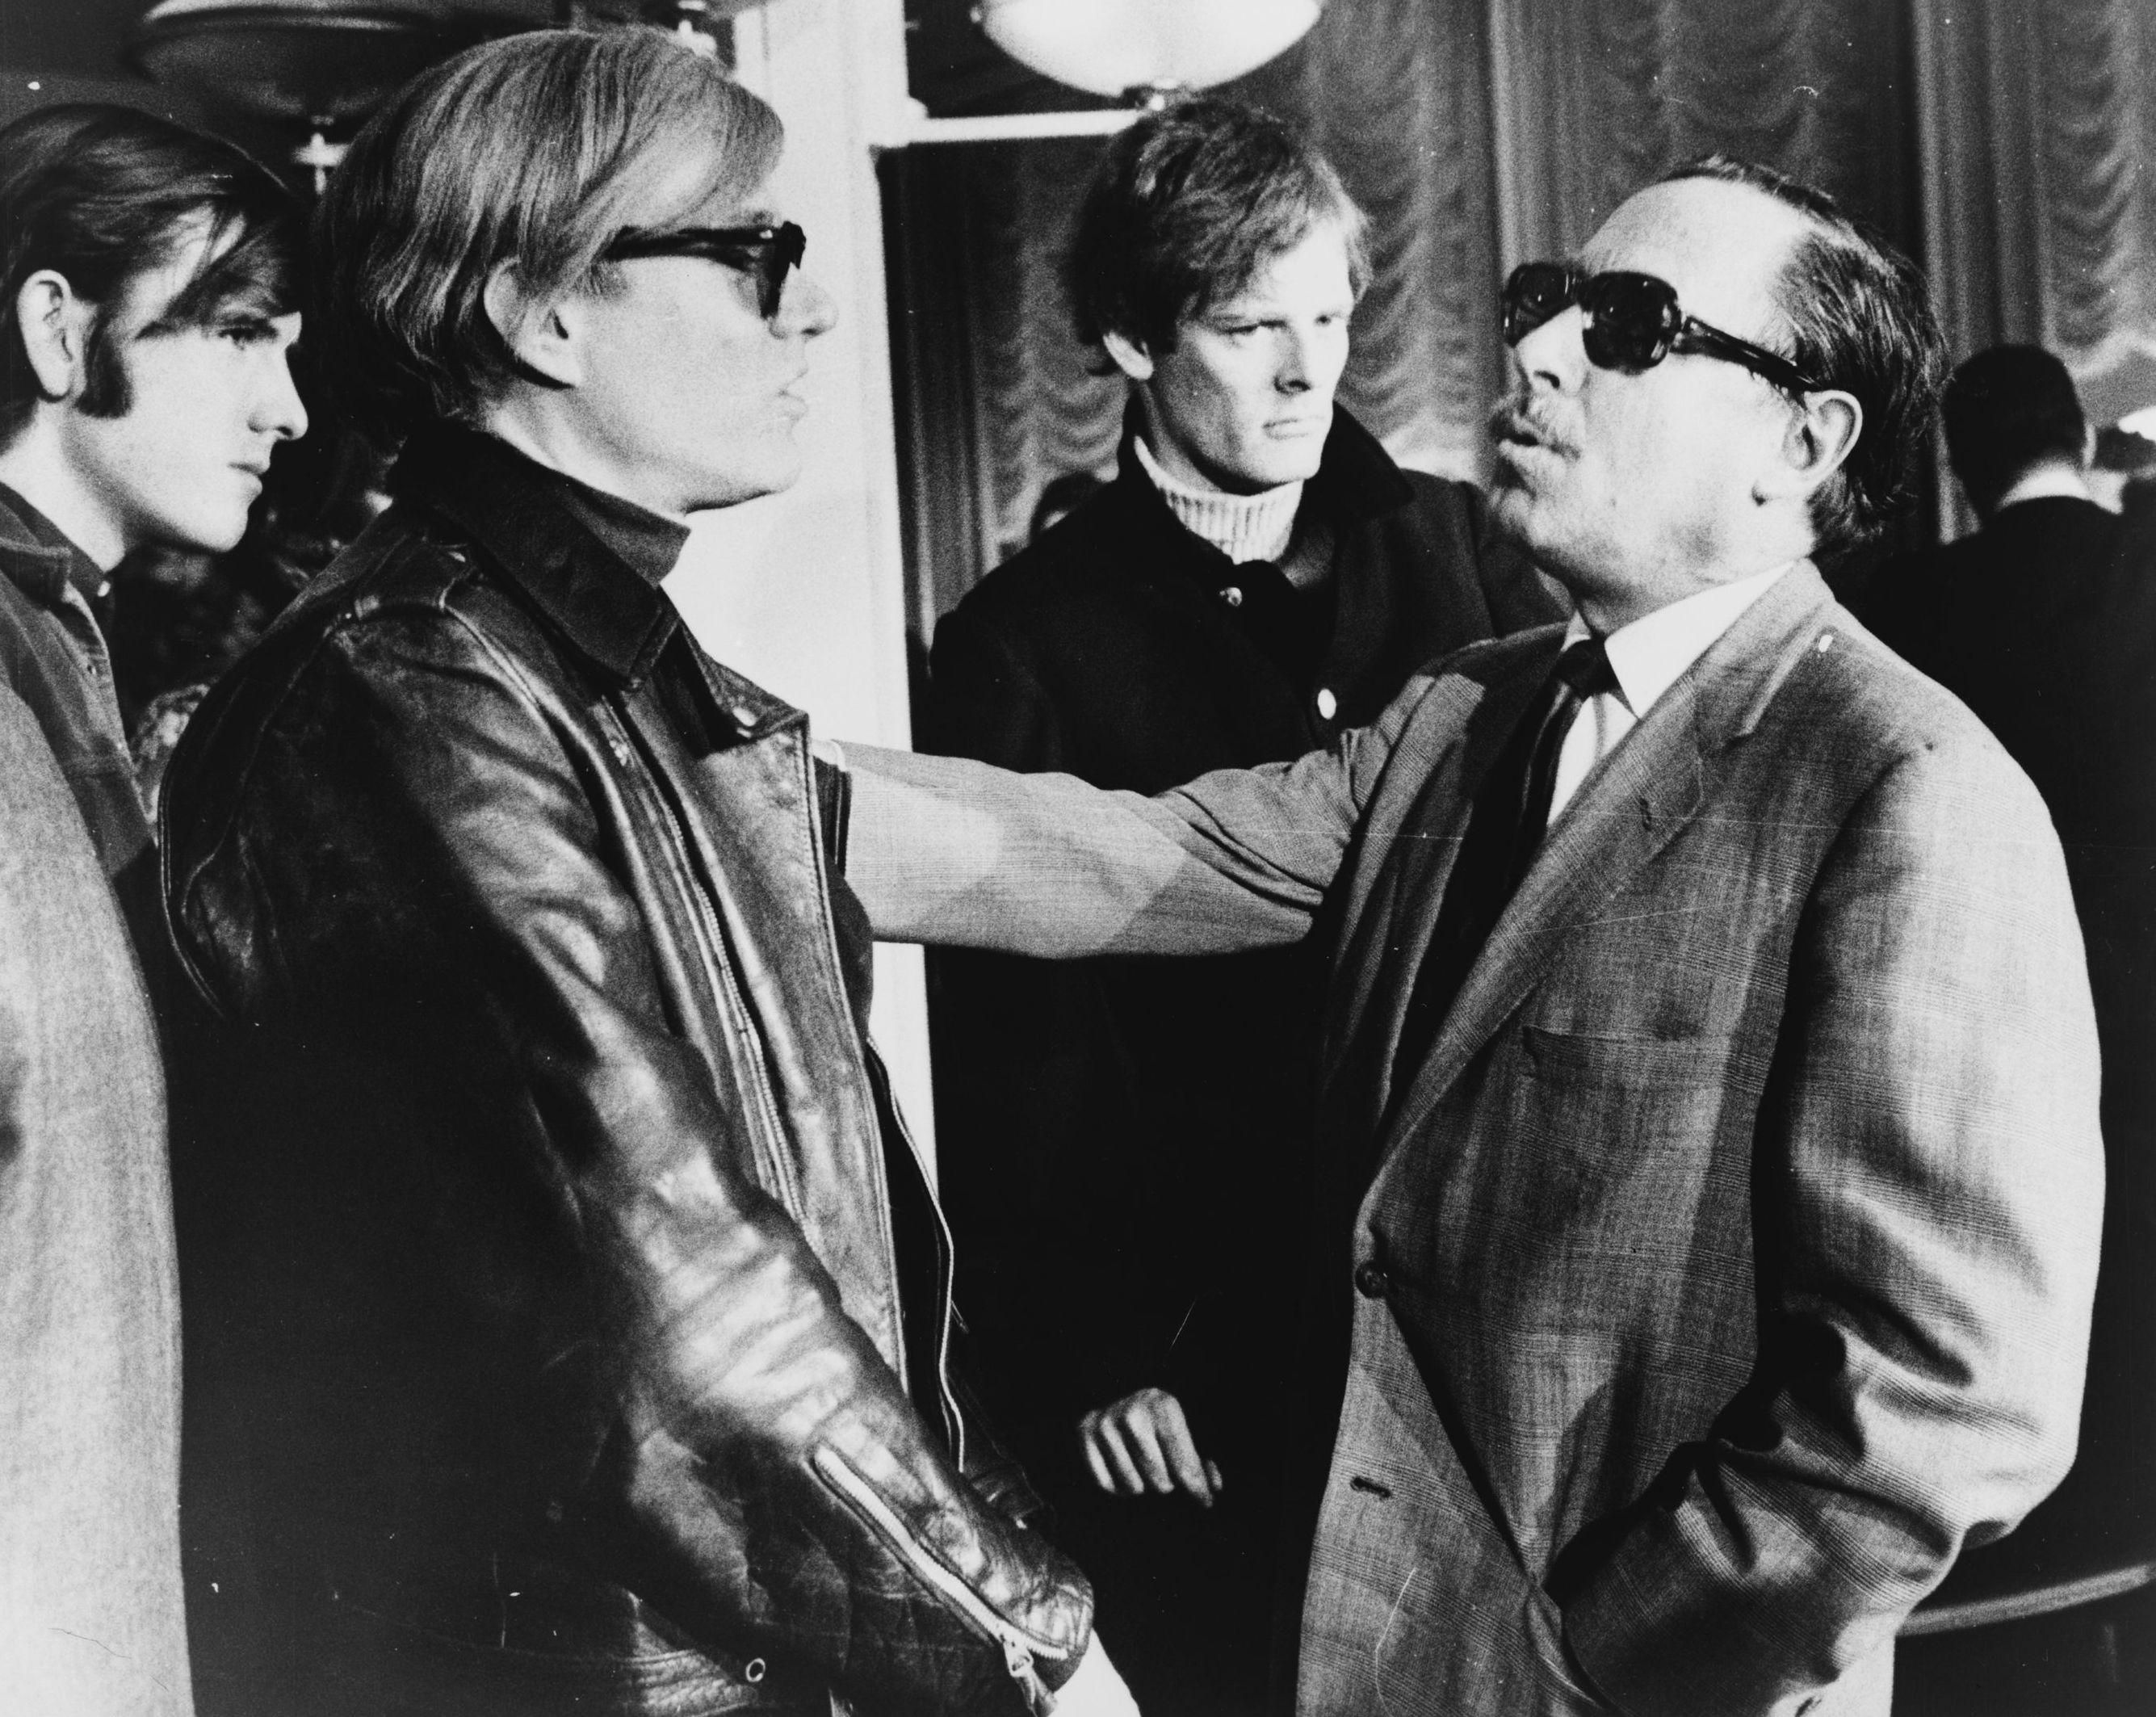 Andy Warhol à esquerda (Foto: Wikimedia Commons )